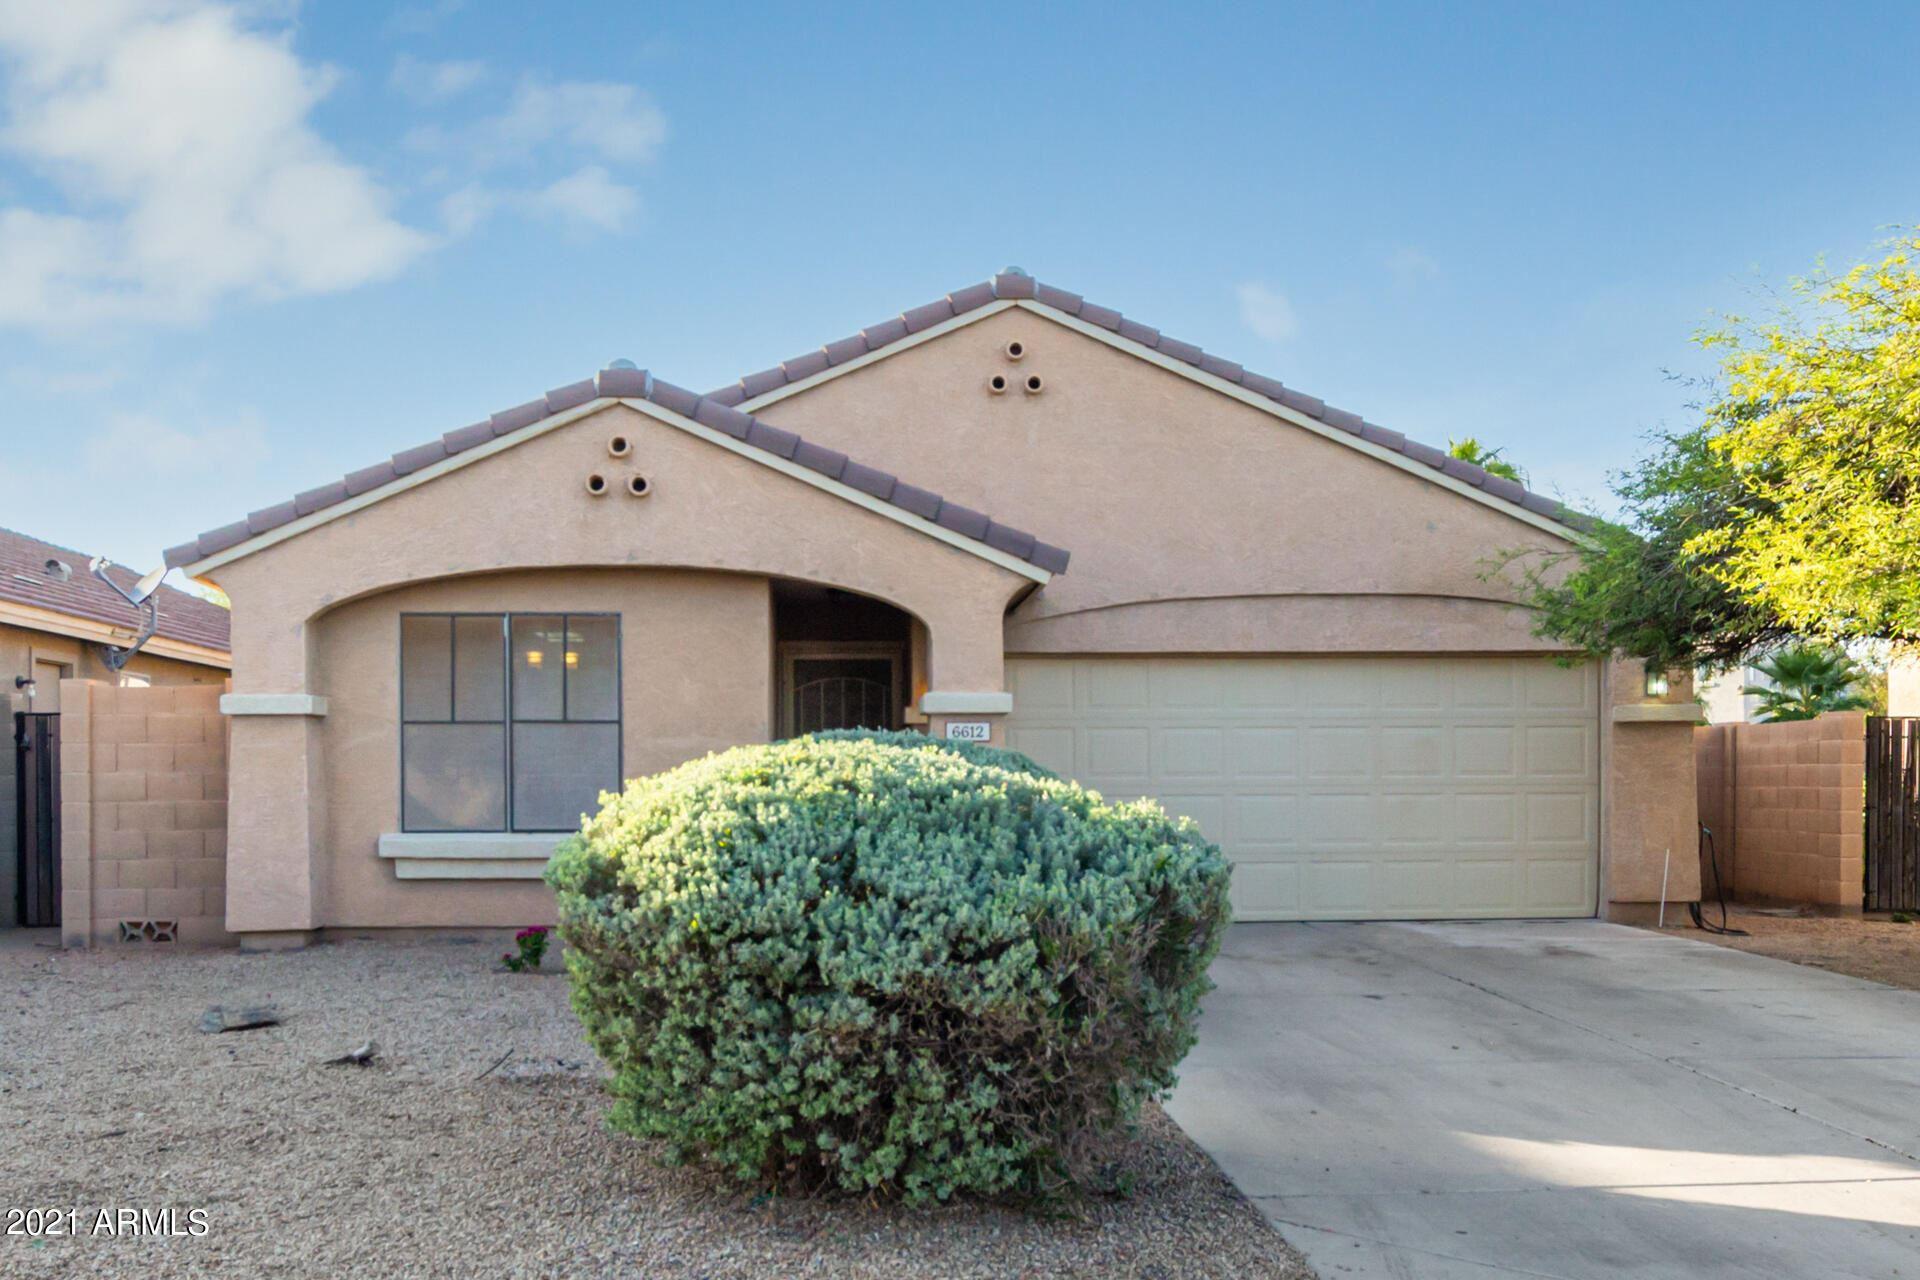 Photo of 6612 W DESERT Lane, Laveen, AZ 85339 (MLS # 6291289)